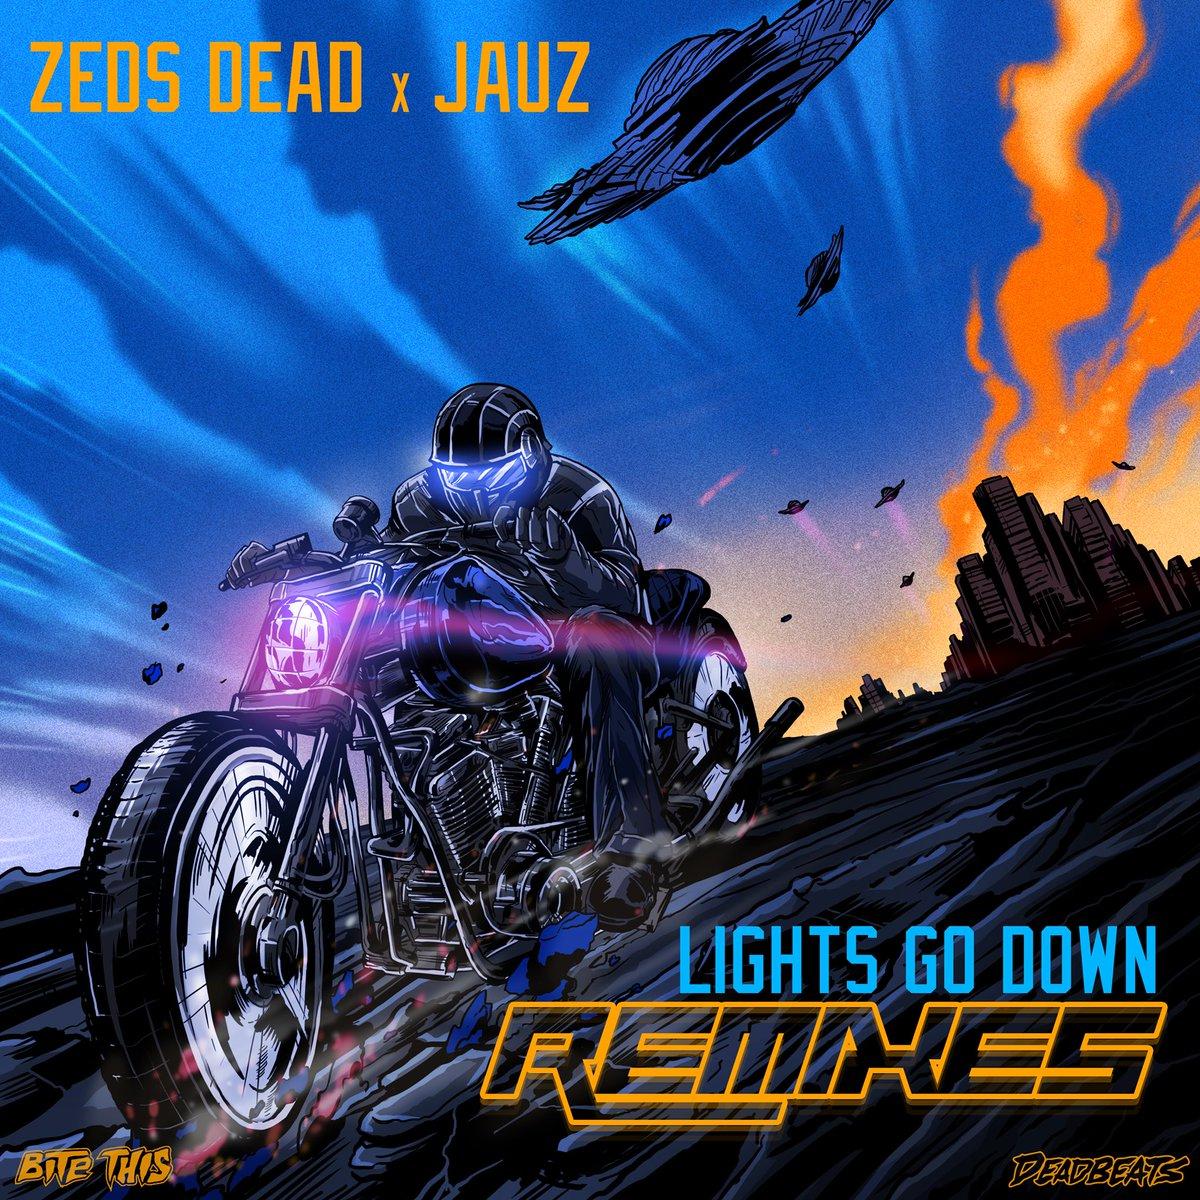 zeds-dead-jauz-sajikan-koleksi-remix-lights-go-down-yang-fenomenal